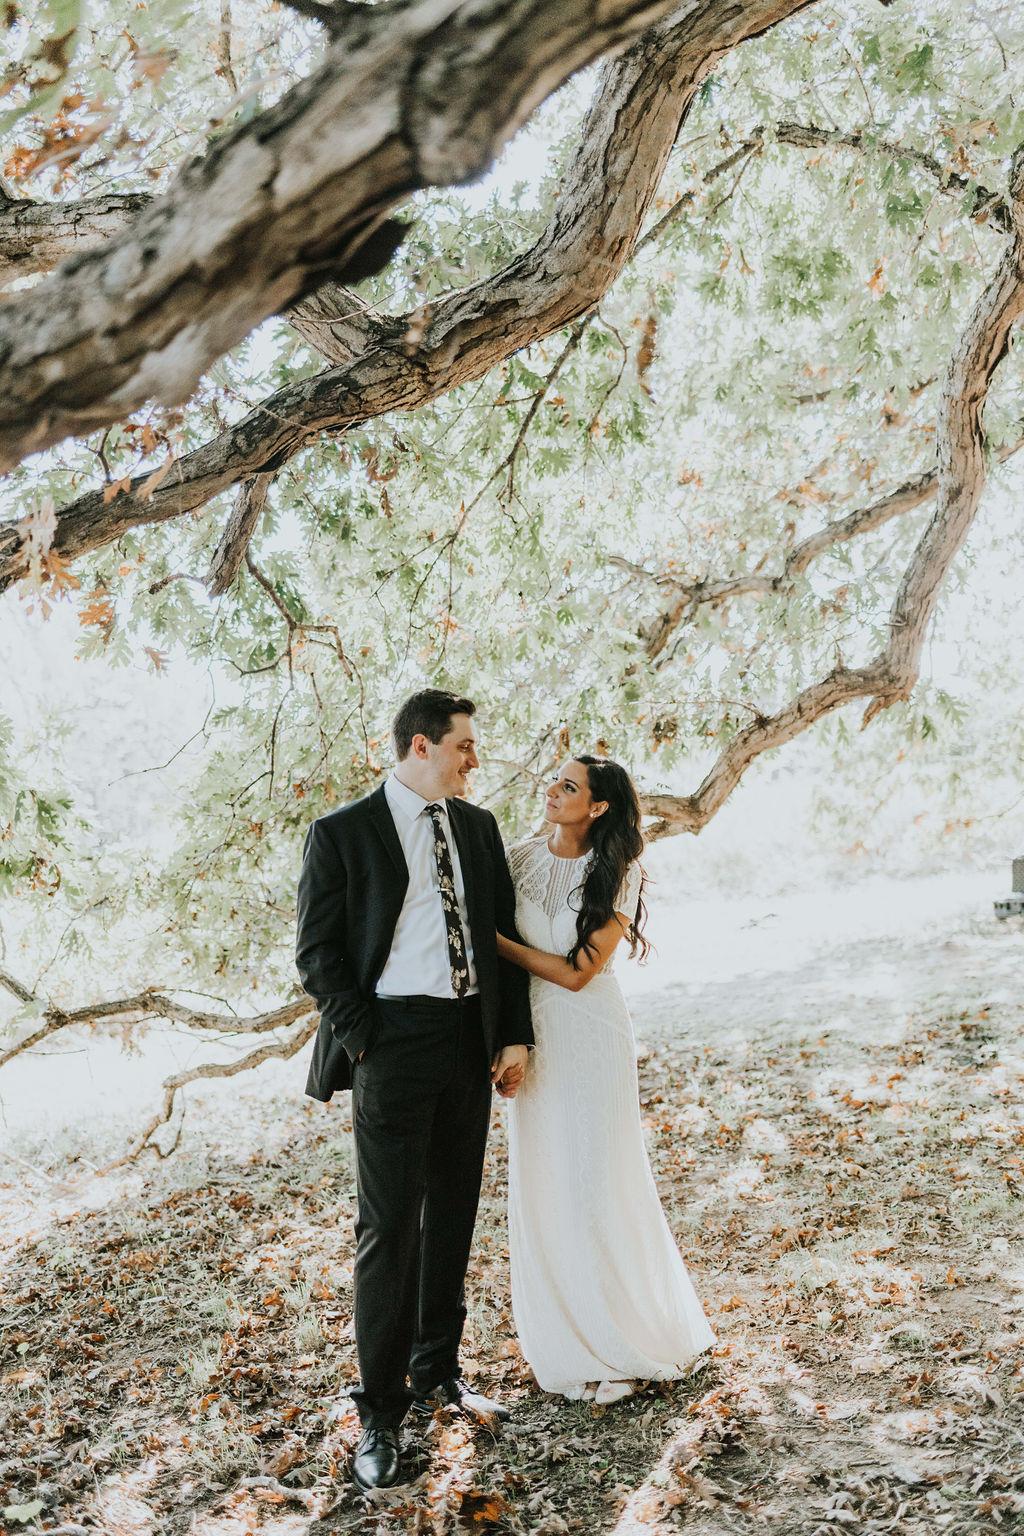 first-look-backyard-wedding-terrapin-village-katie-griff.jpg